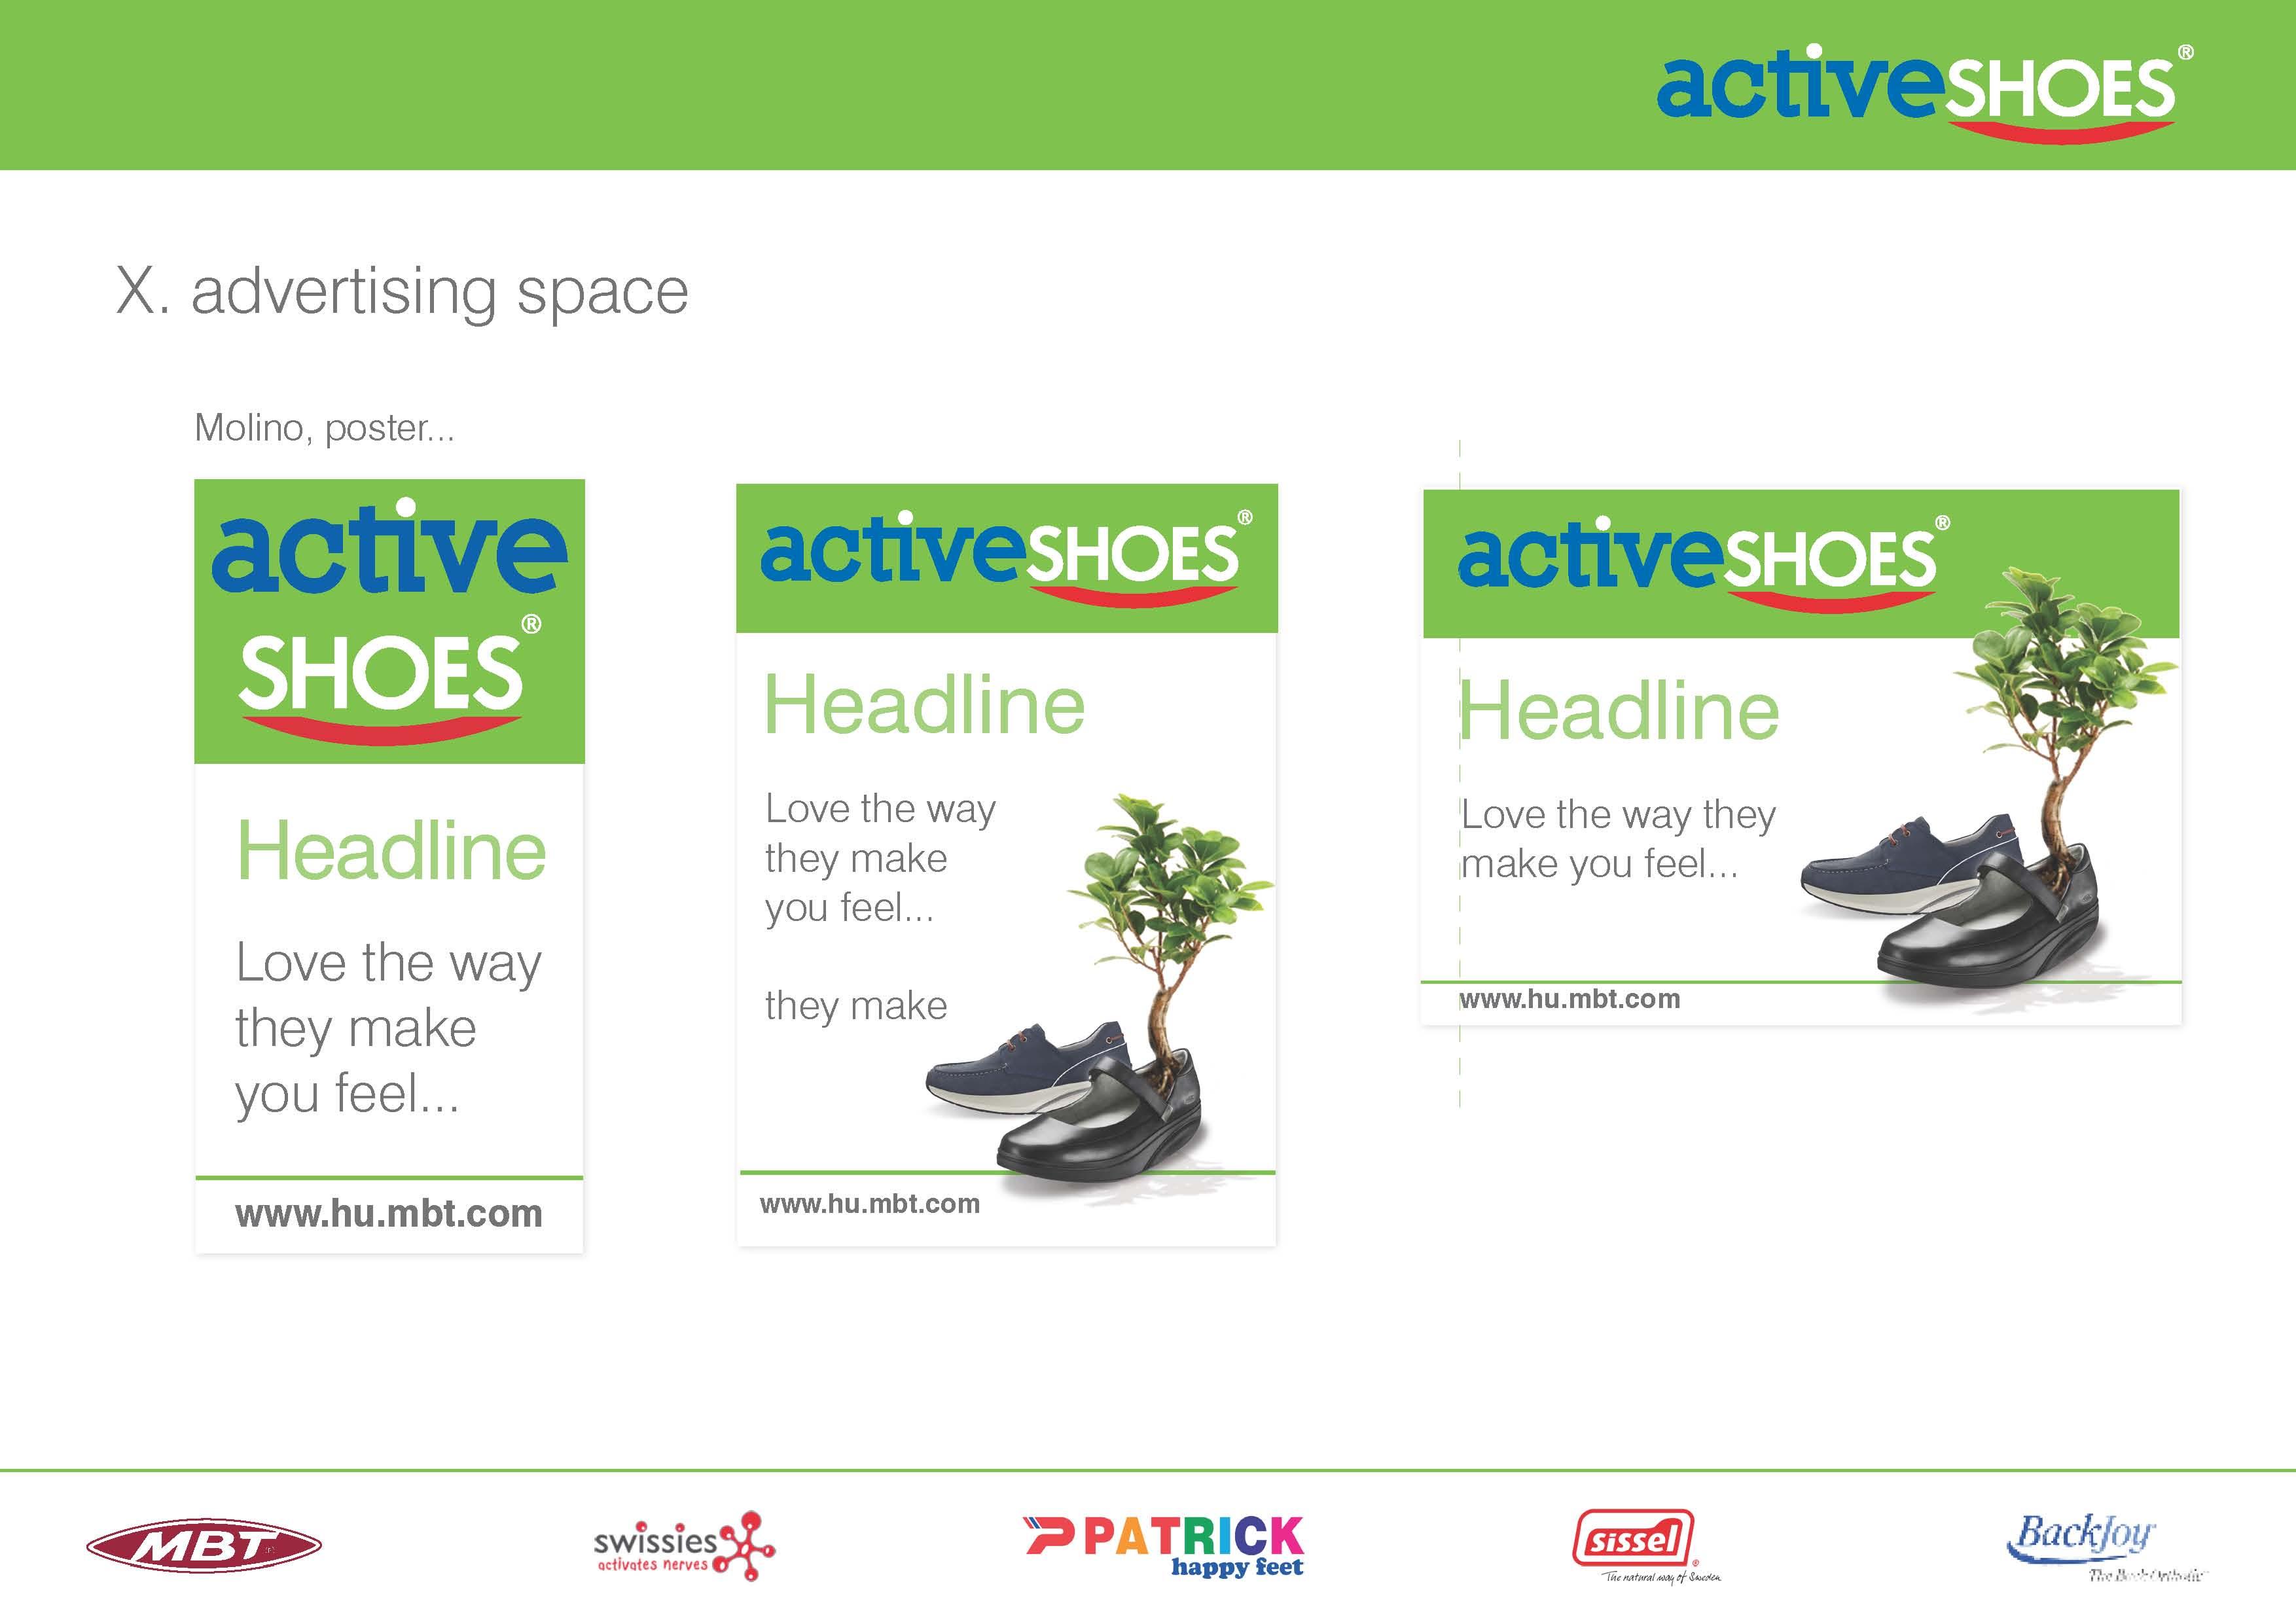 activeshoes_designbook_2011_07_A4-es_4_Page_12